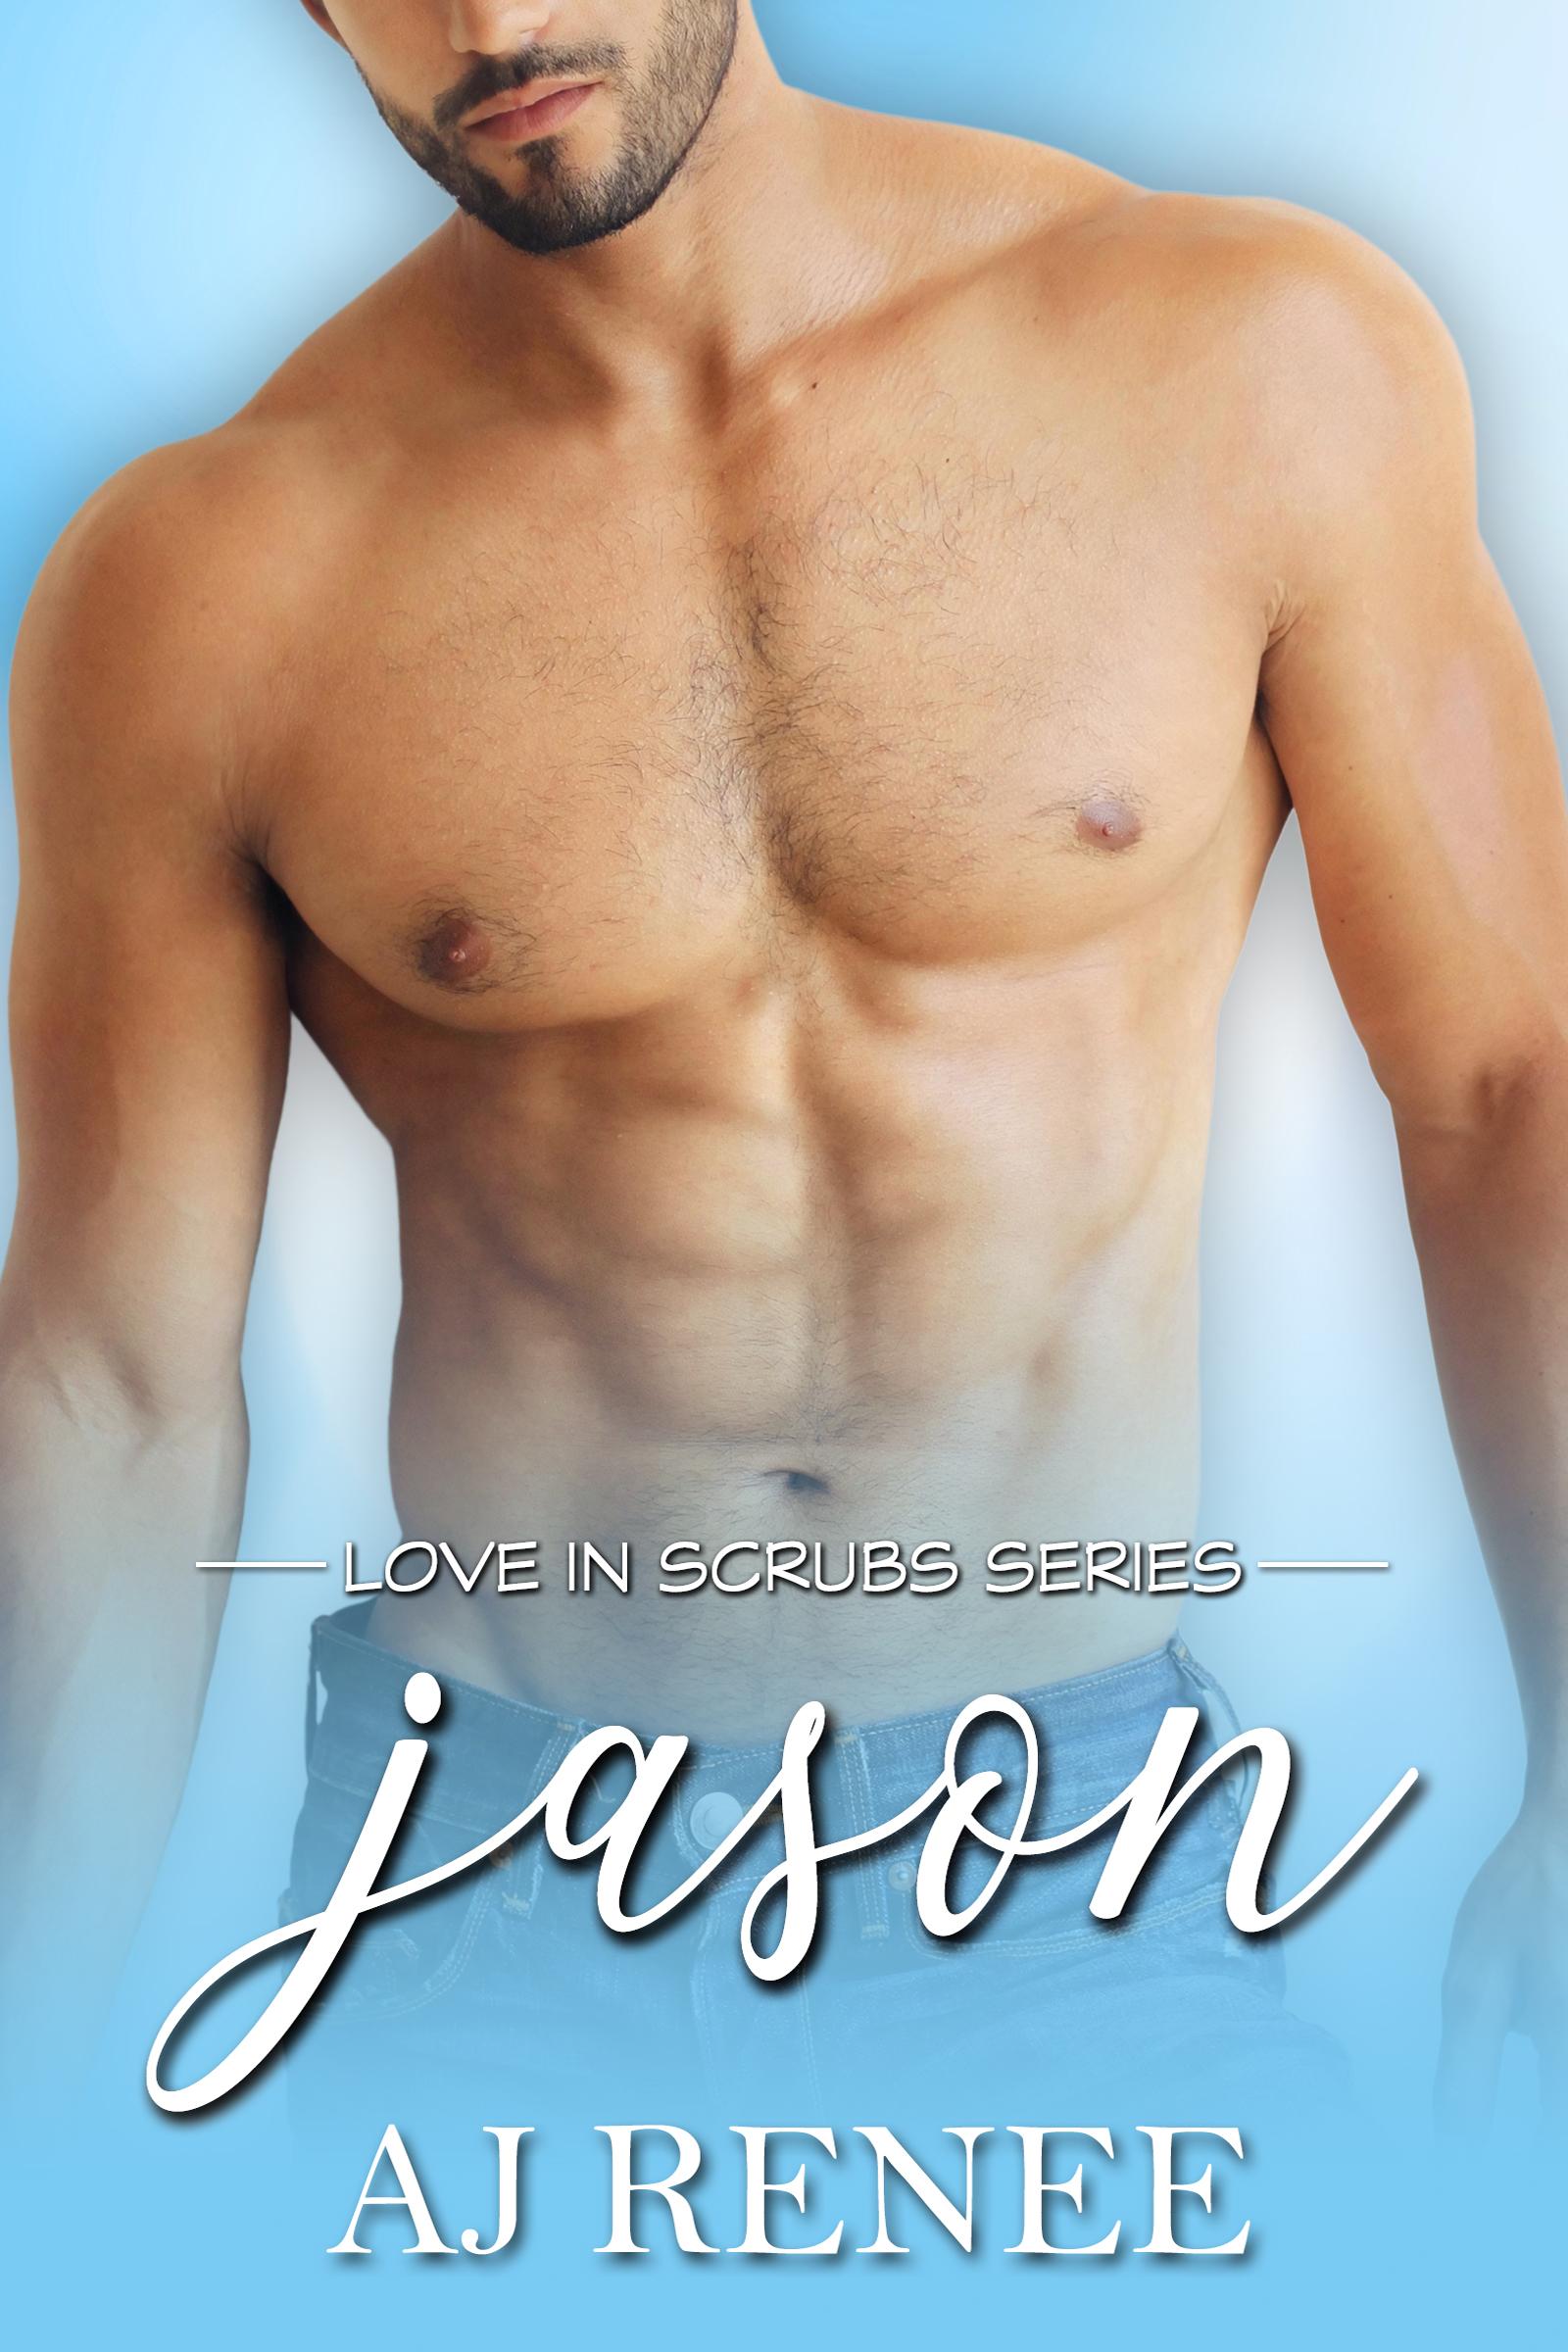 Jason by AJ Renee must read One click